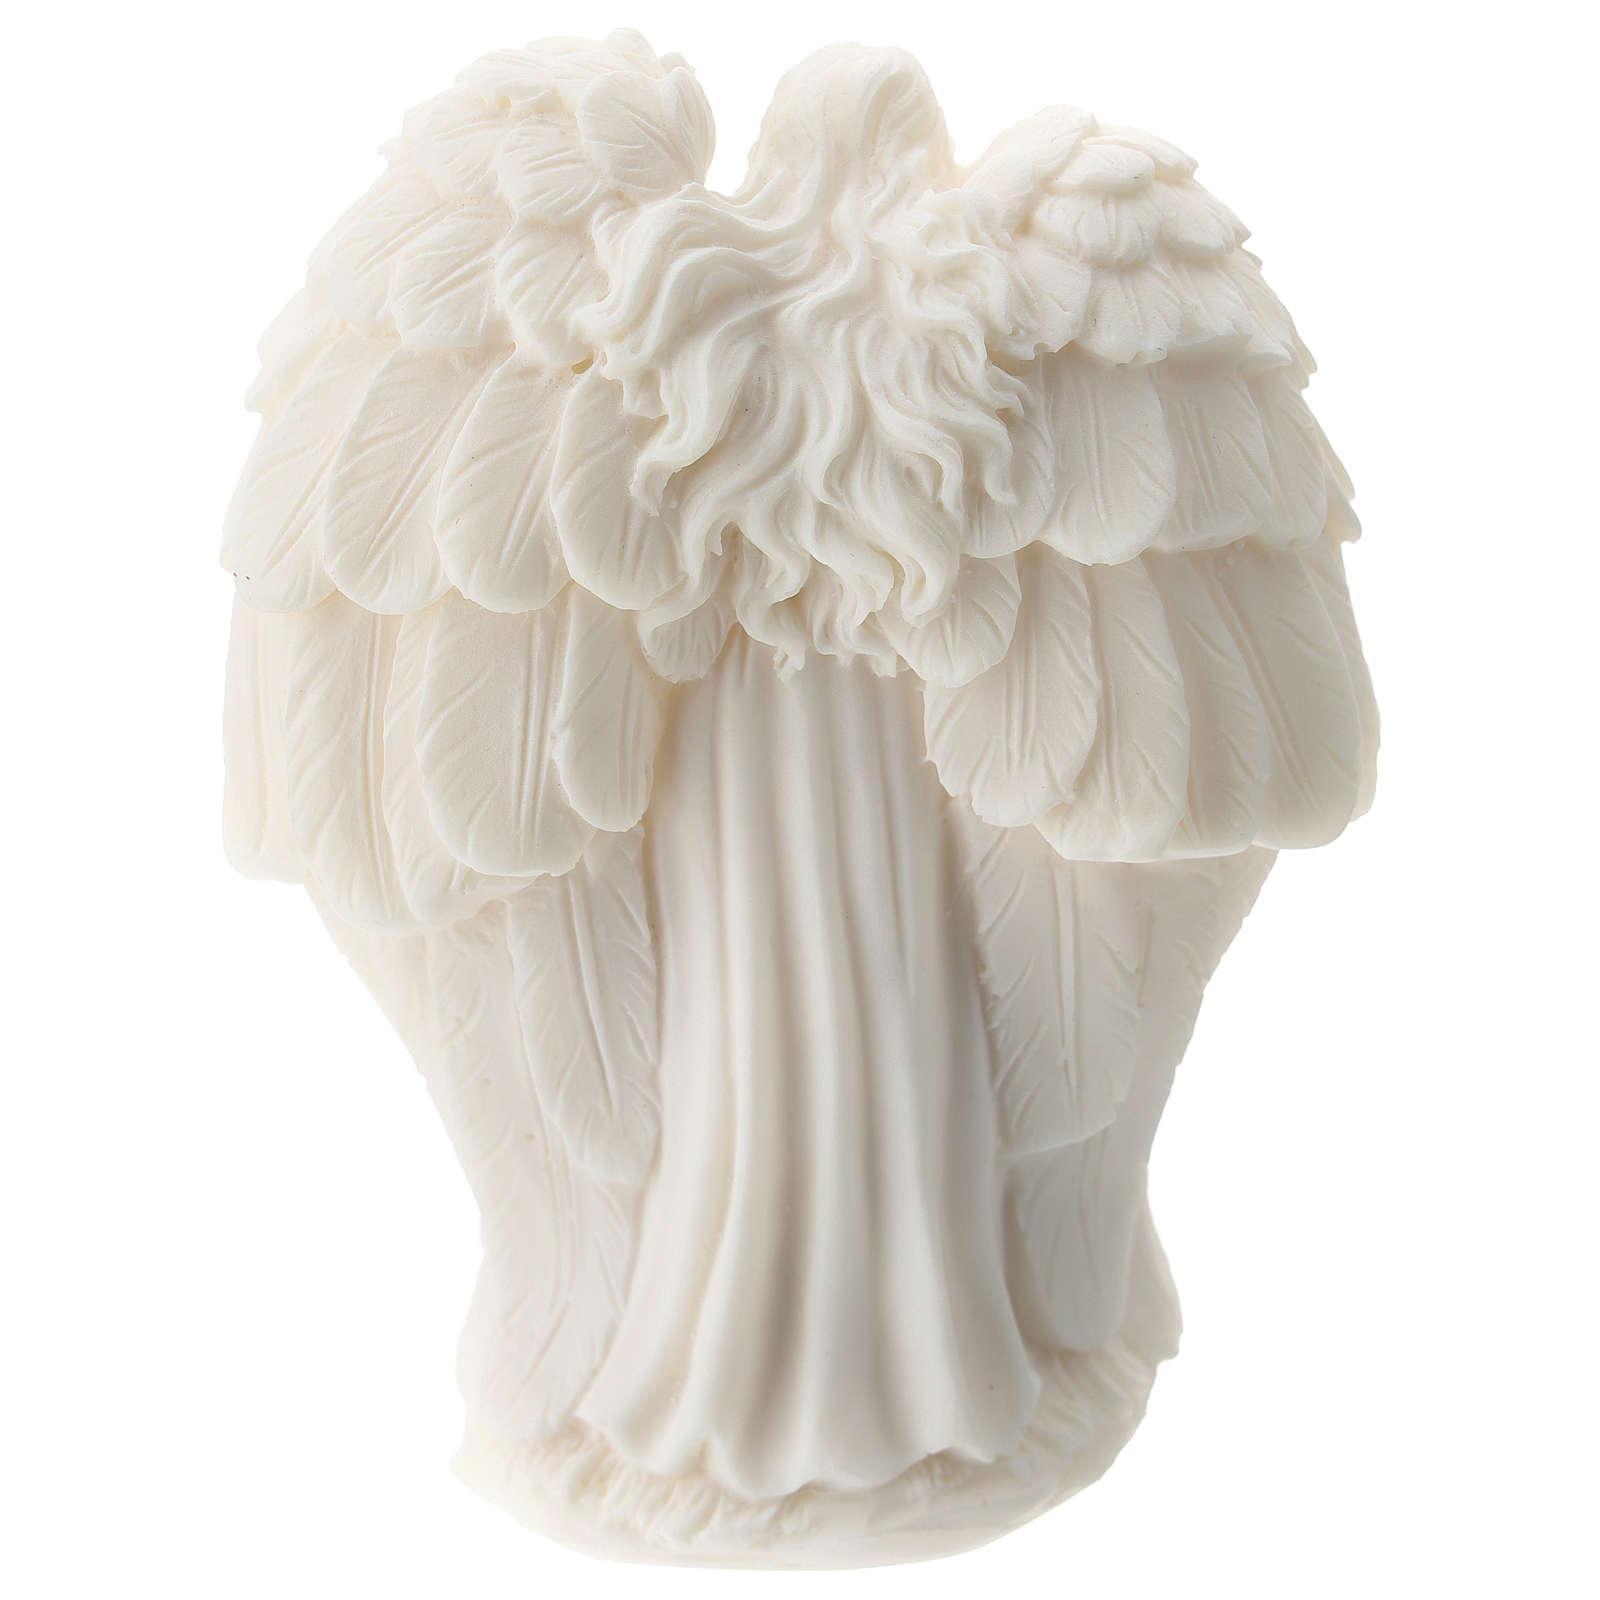 Sagrada Familia con Ángel resina blanca 10 cm 3